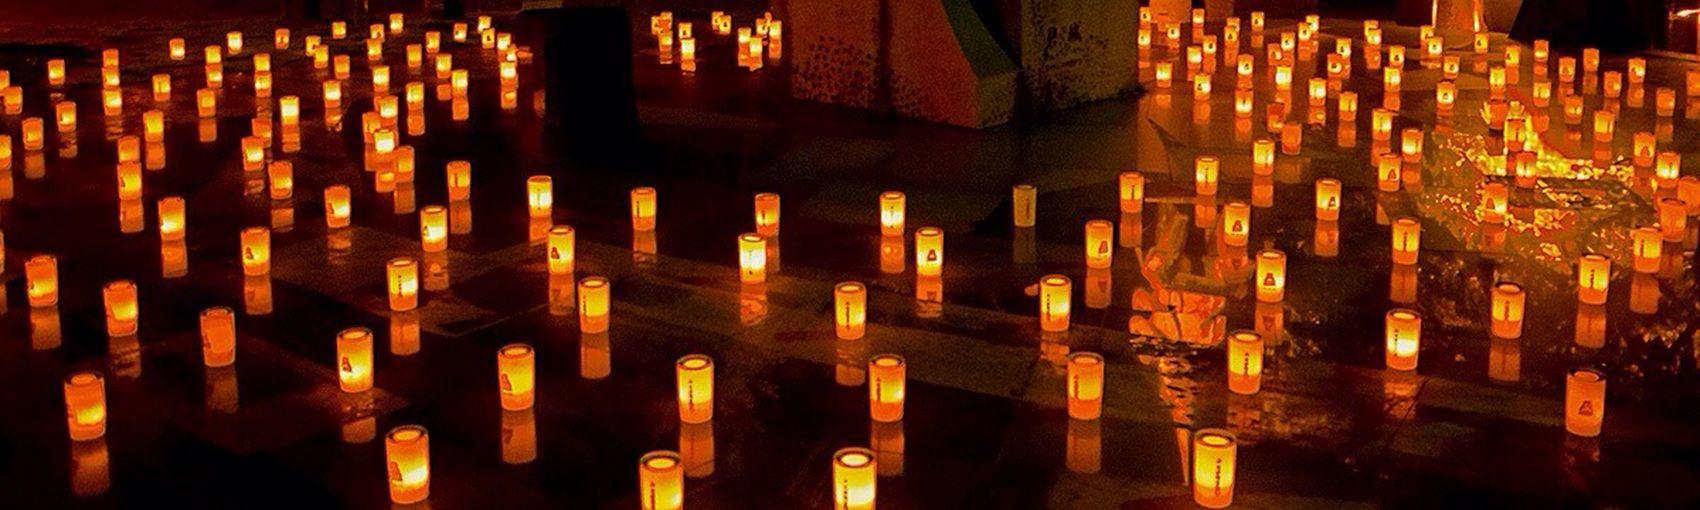 Lantern of Kumamoto Fire Country Festival Tadaa Night View Lantern Night Photography